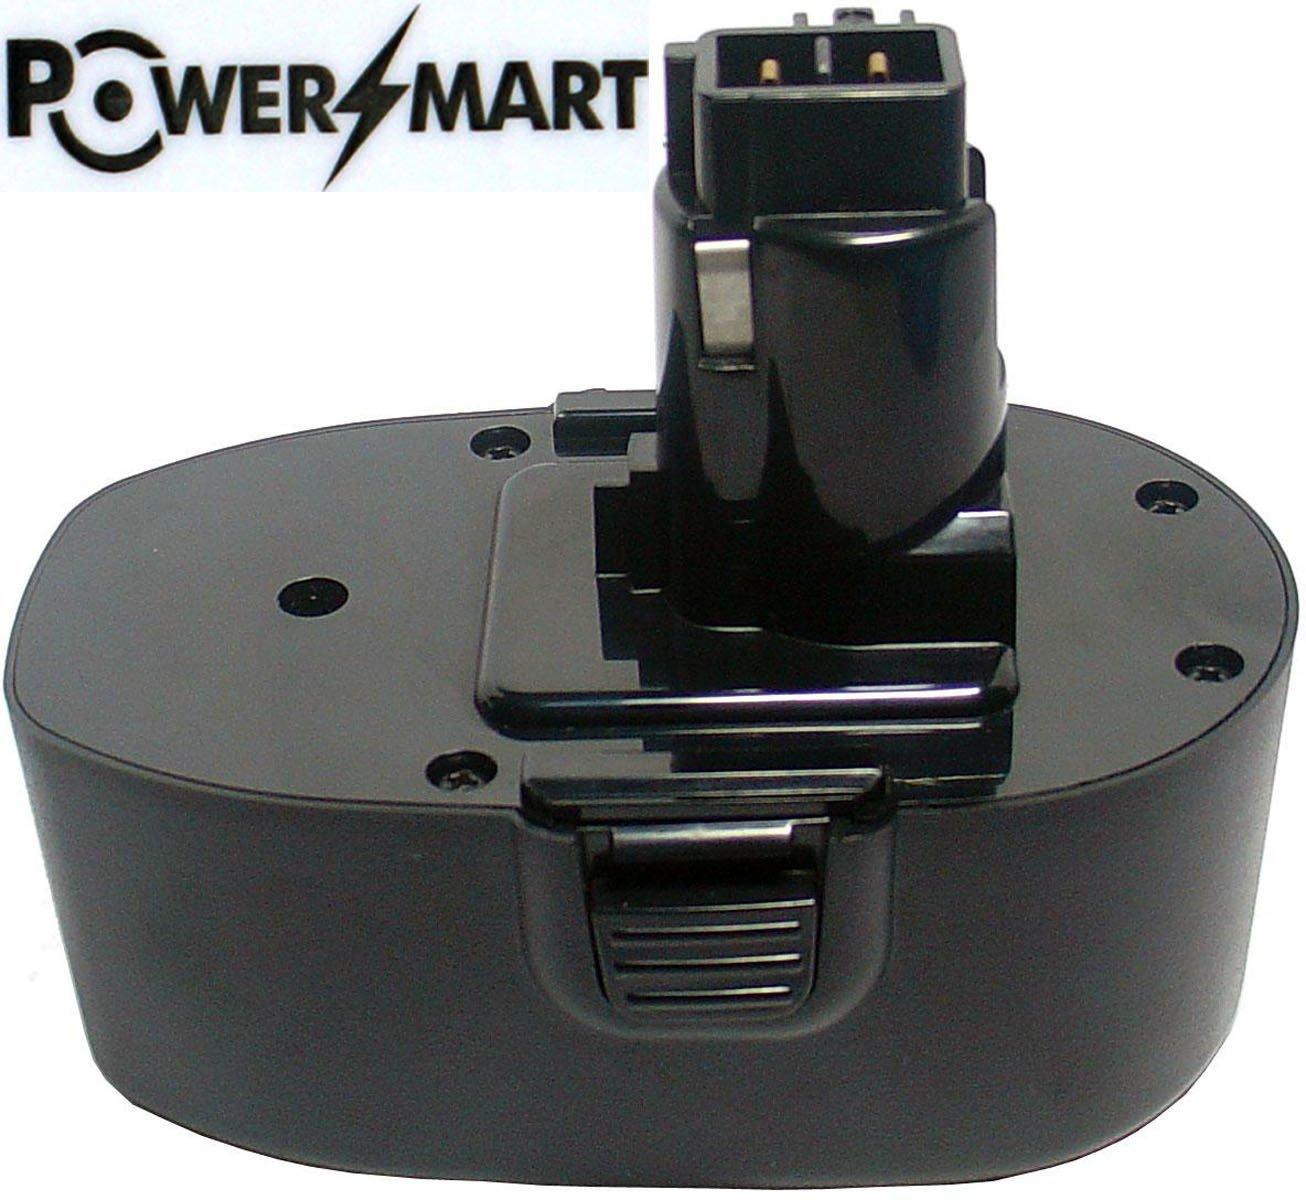 PowerSmart 18V 1500mAh Ni-Cd A9282, PS145 Battery for Black & Decker CD18C, CD18CA, CD18CAB, CD18CBK,